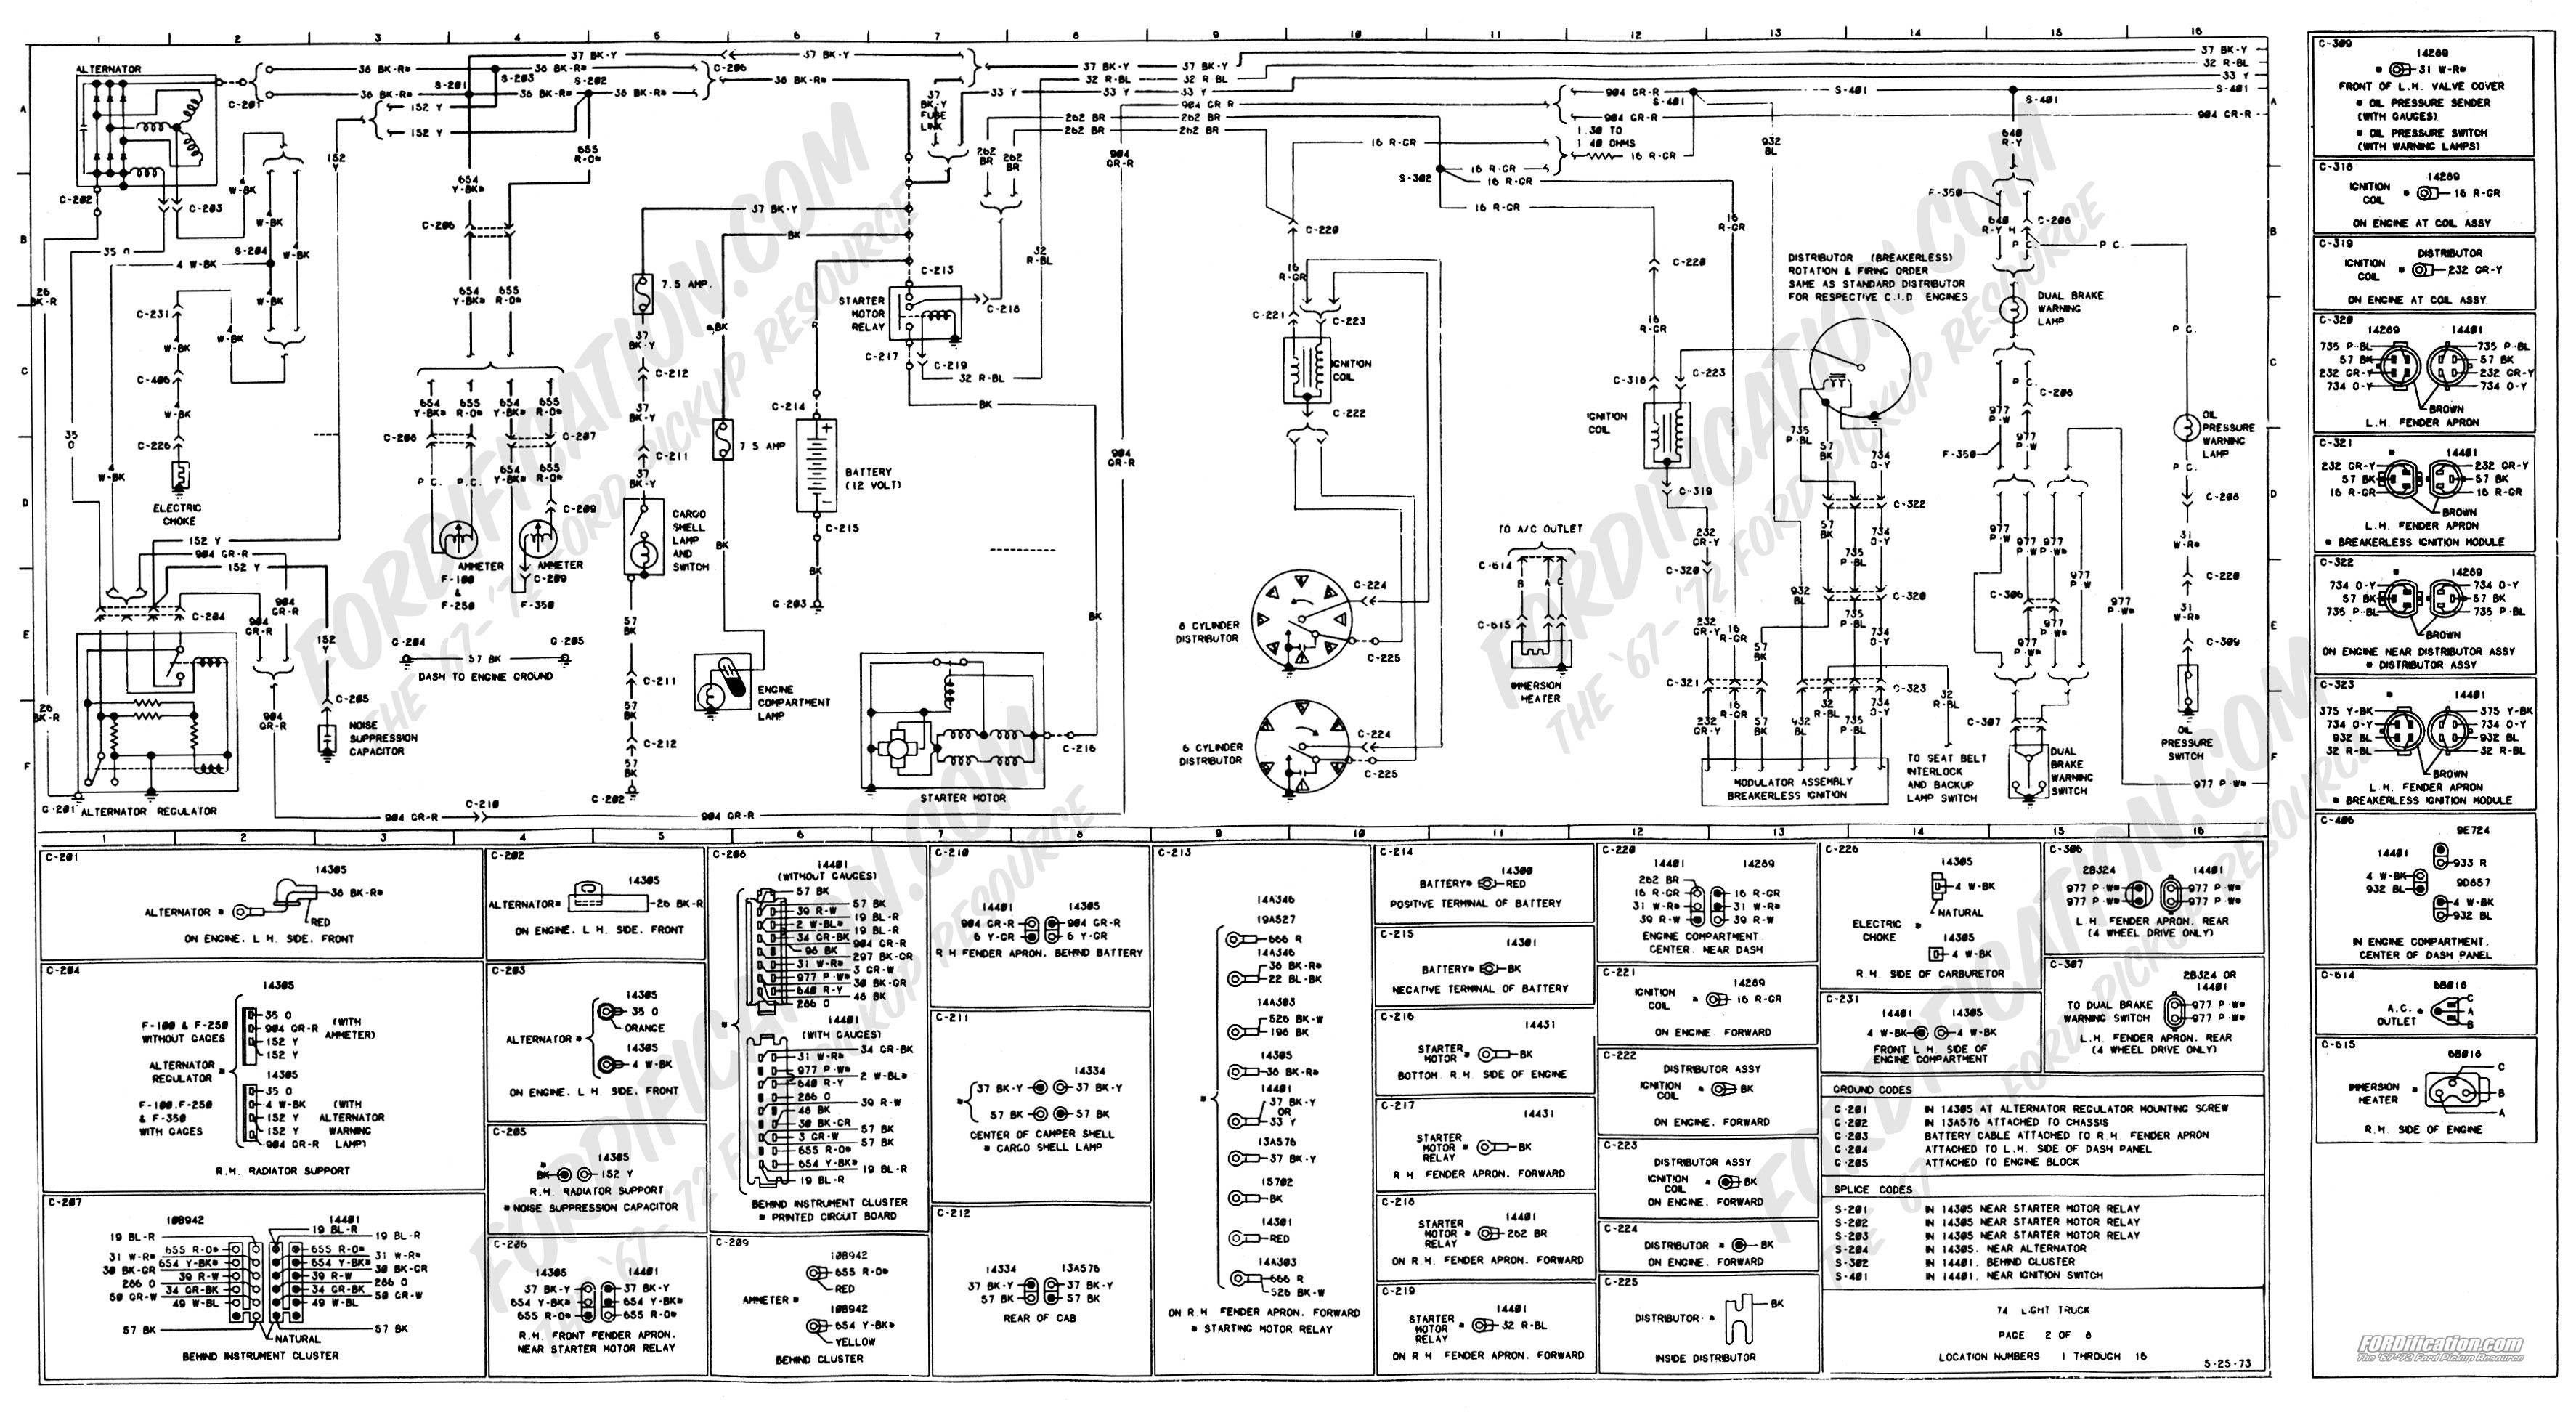 2000 sterling wiring diagram wiring diagram detailed Sterling Unit Heater Distributors 2000 ottawa wiring diagram wiring diagram sterling heater wiring schematic 2000 sterling wiring diagram